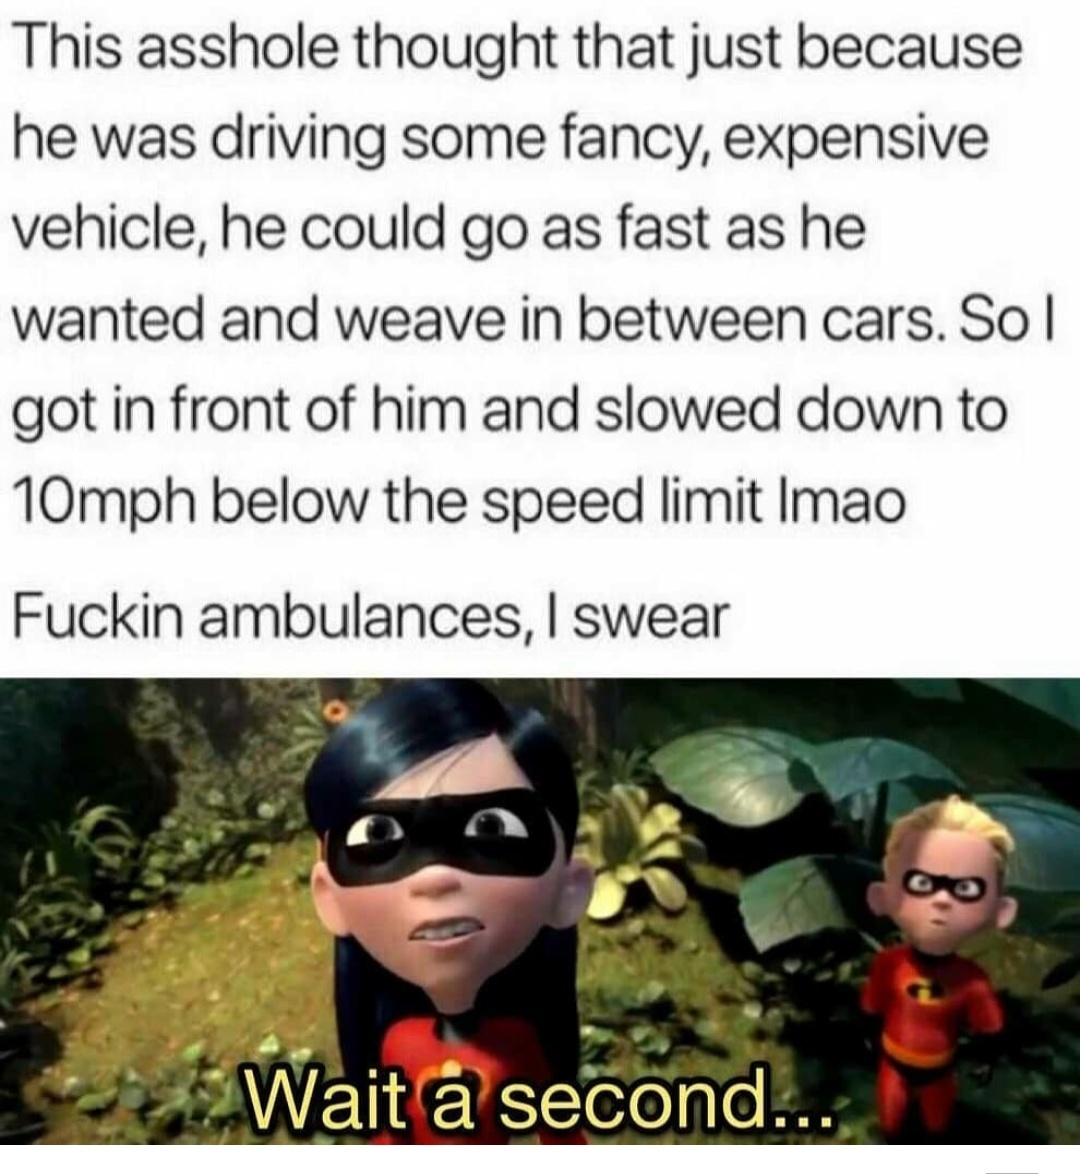 I swear - meme